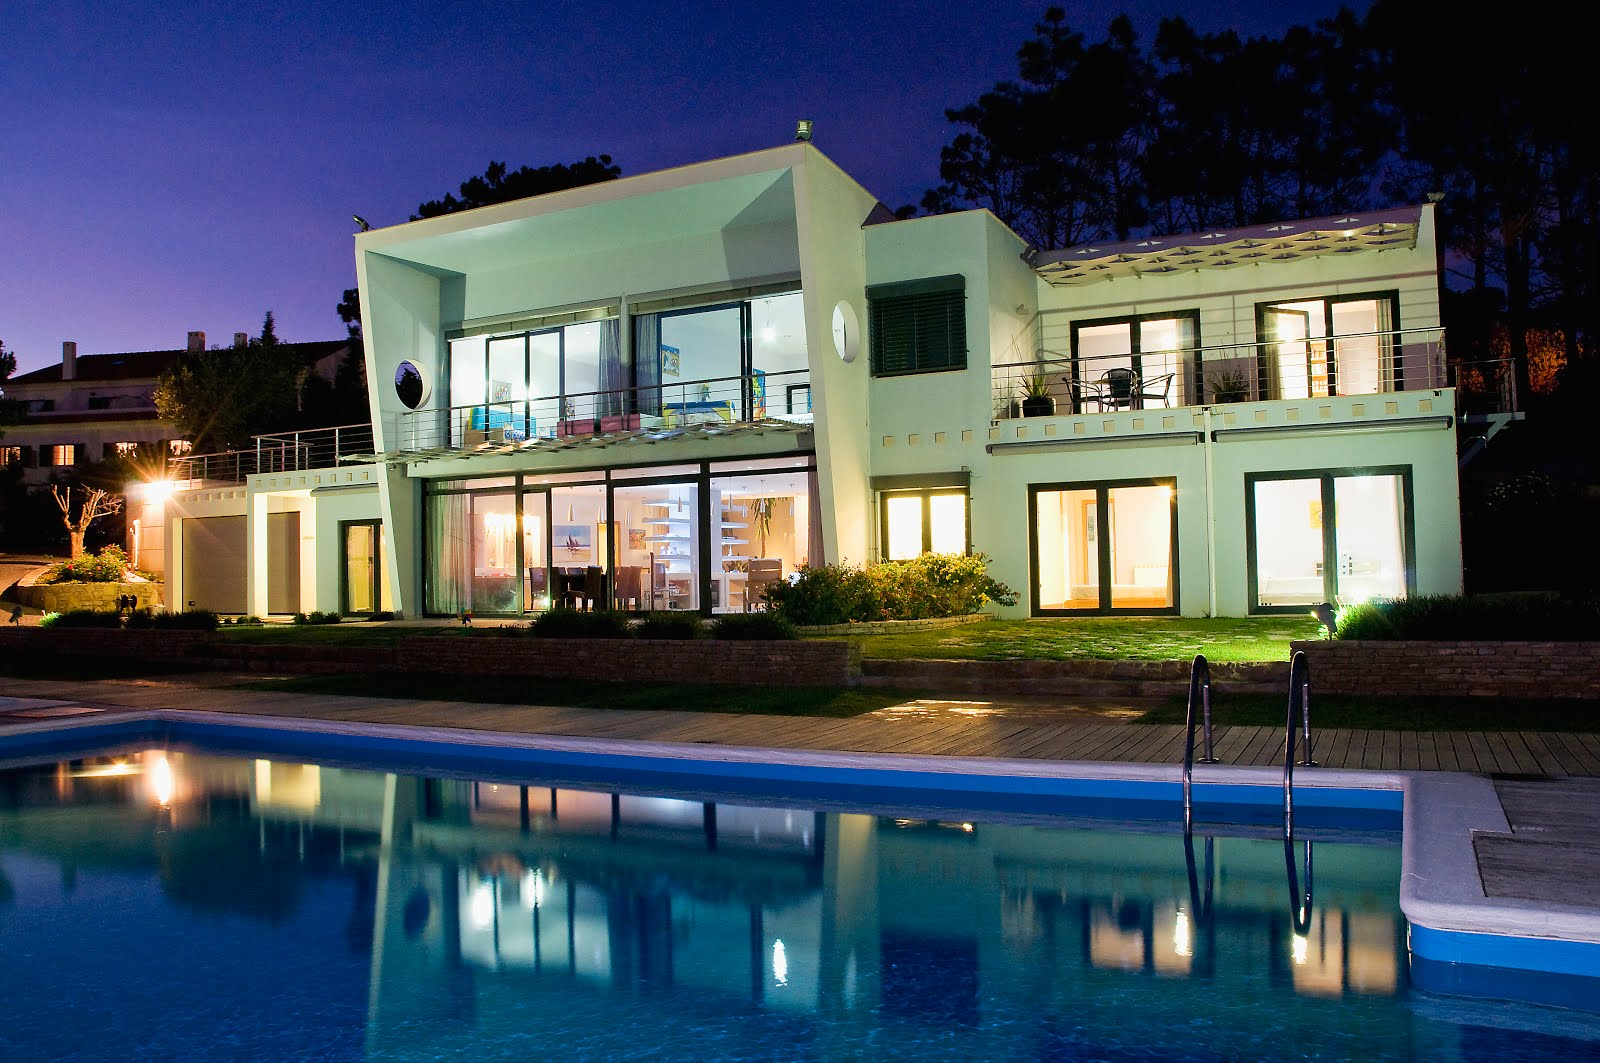 located at the north of Lisbon, Obidos lagoon, Foz do Arelho Resort